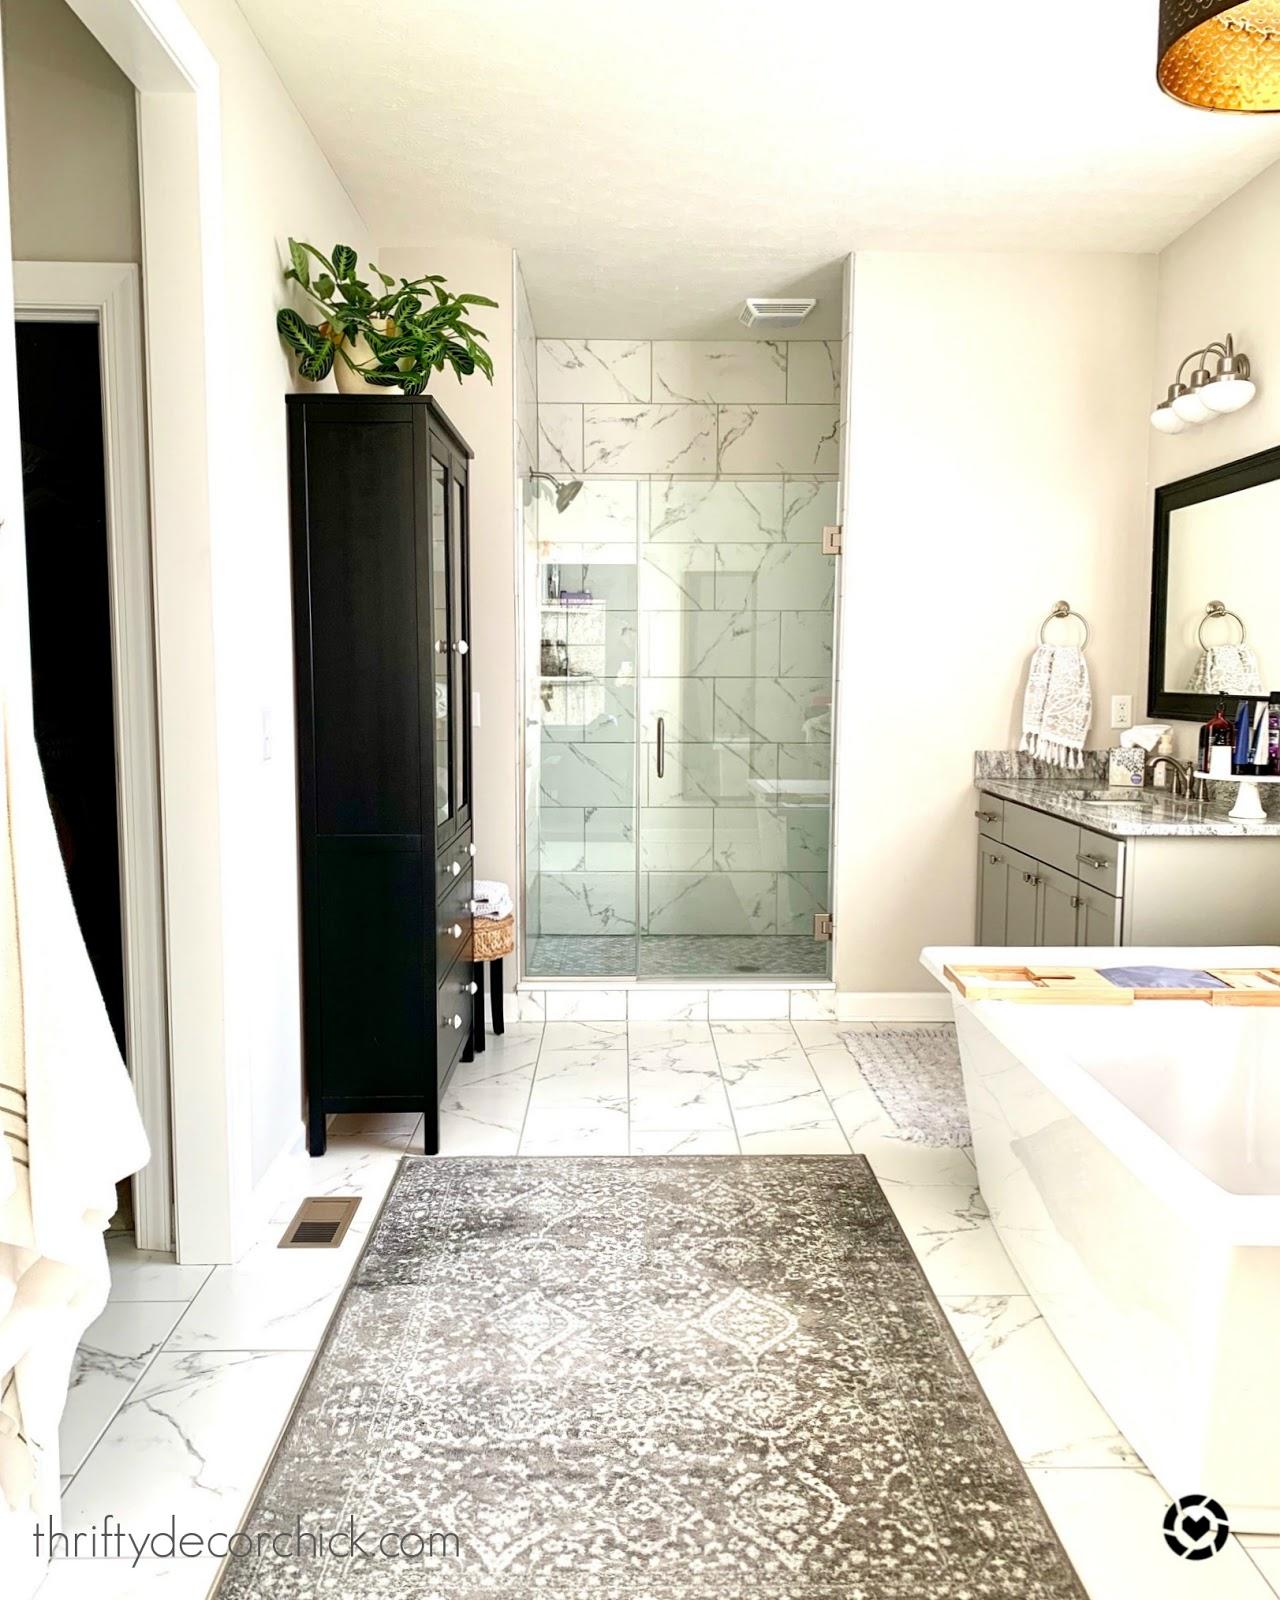 Large shower and soaking tub bathroom